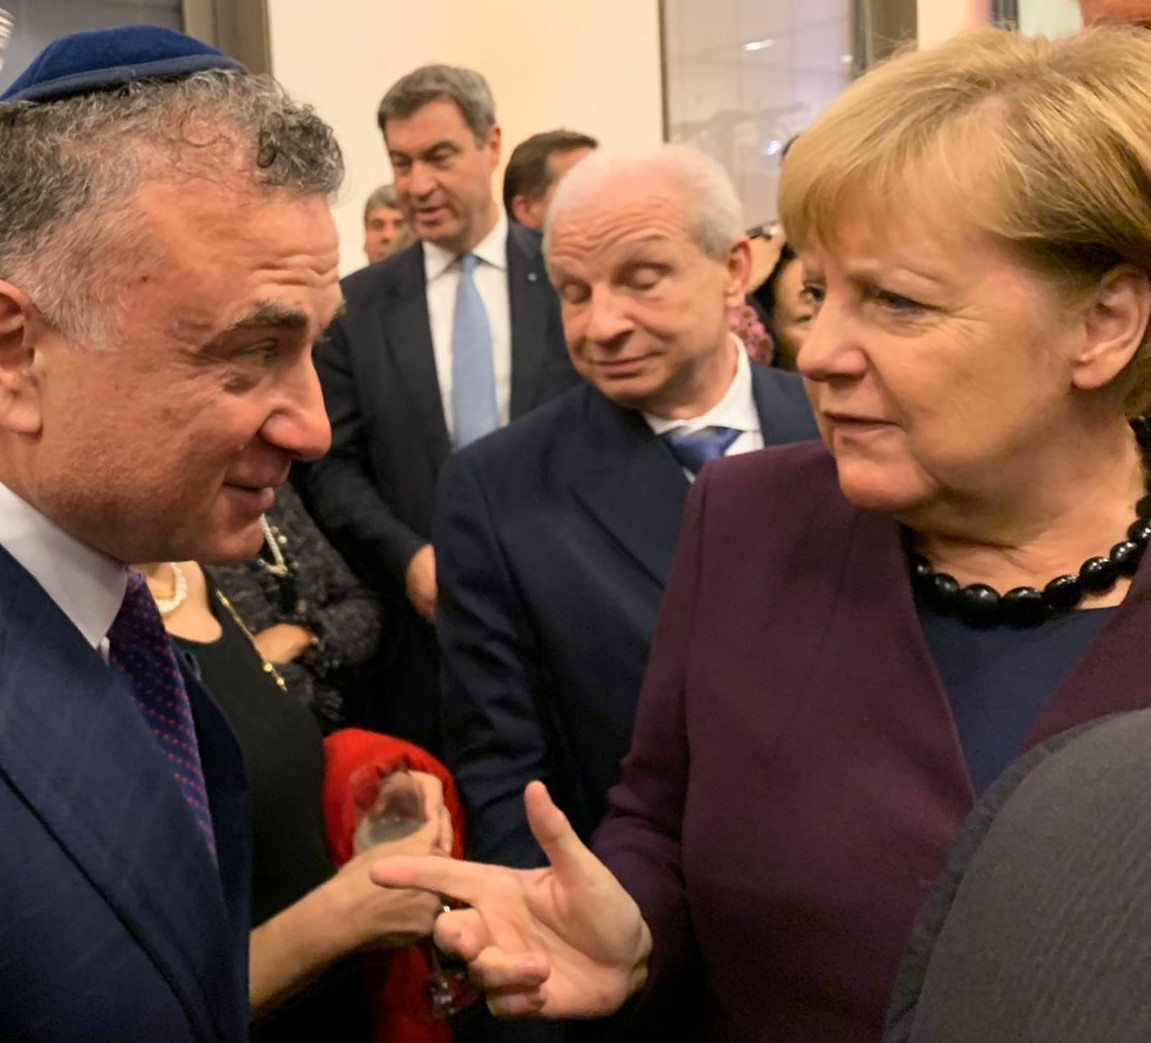 Meeting Germany's Chancellor Angela Merkal at the World Jewish Congress